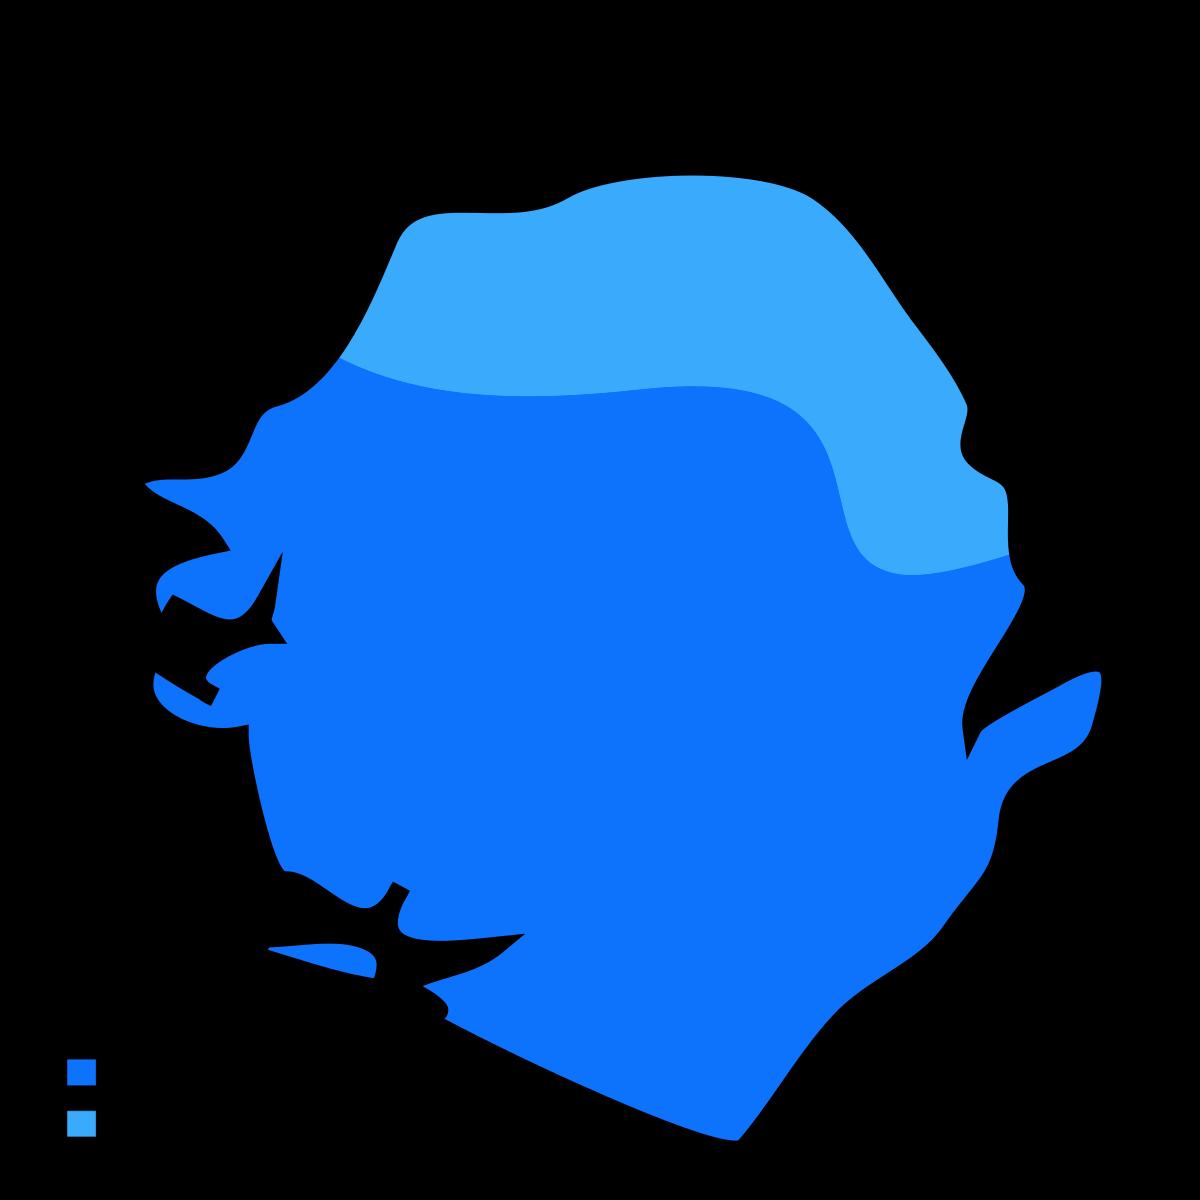 Geography of Sierra Leone.